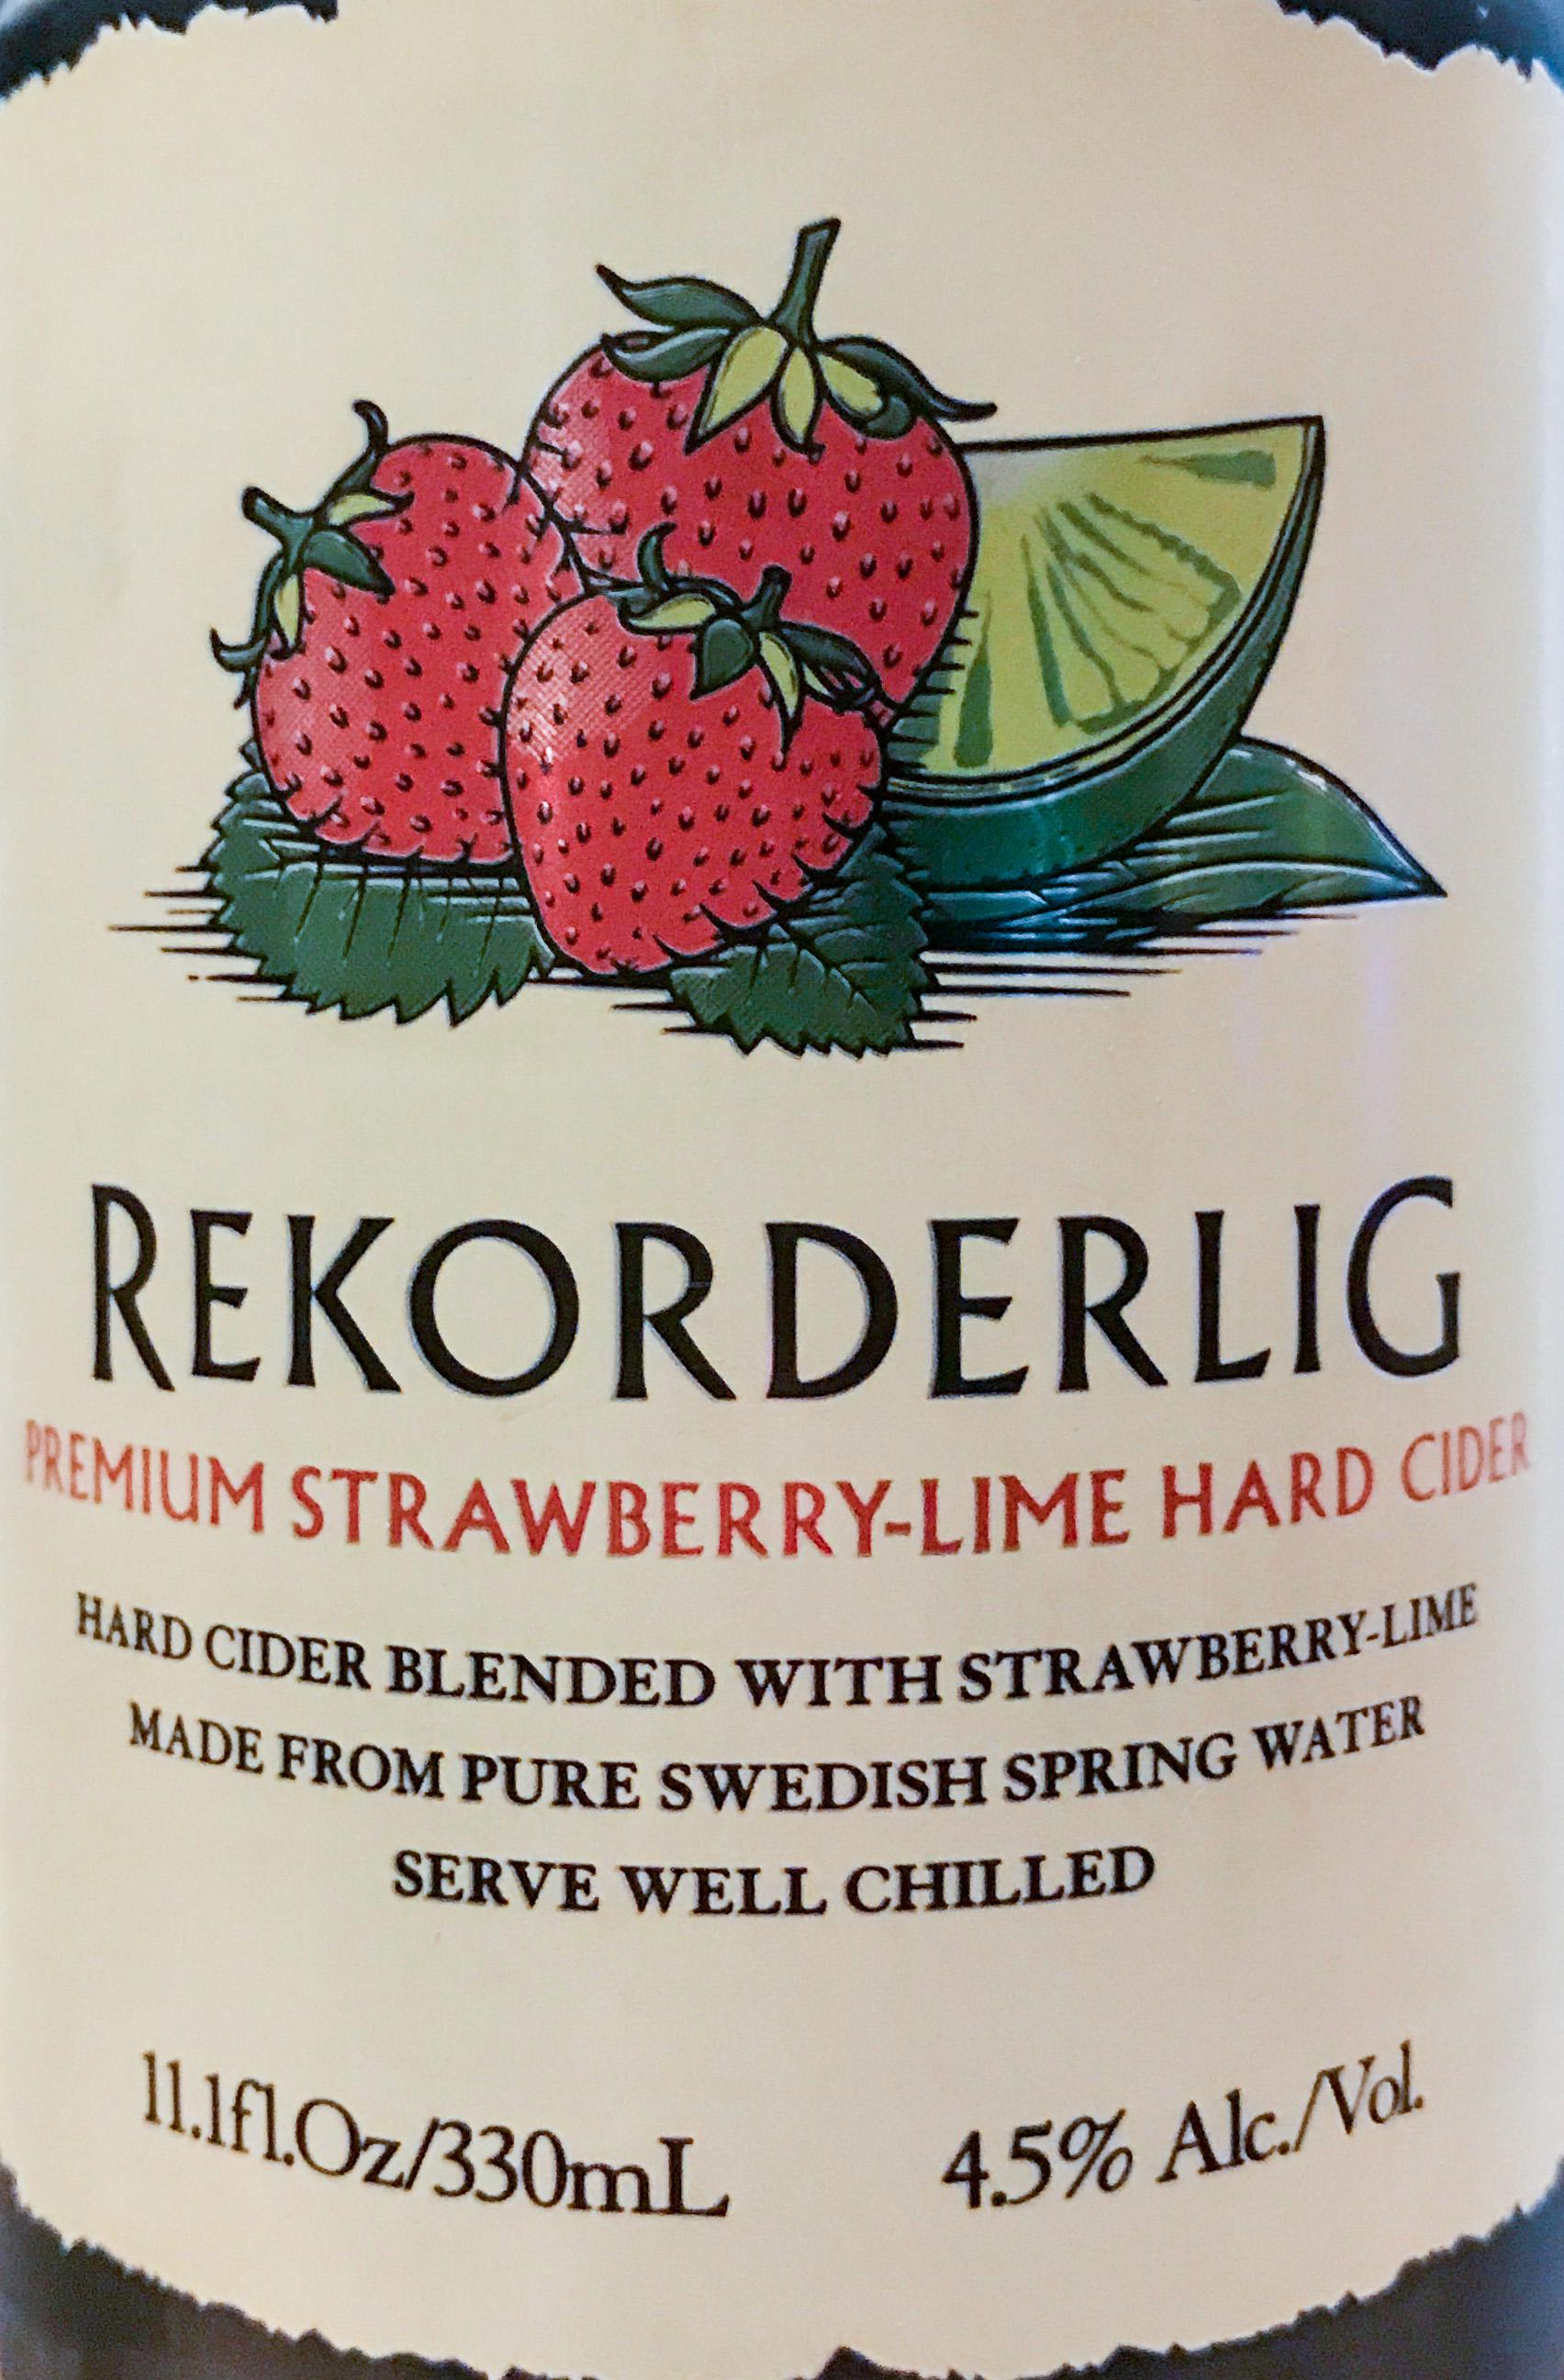 Strawberry-Lime Hard Cider